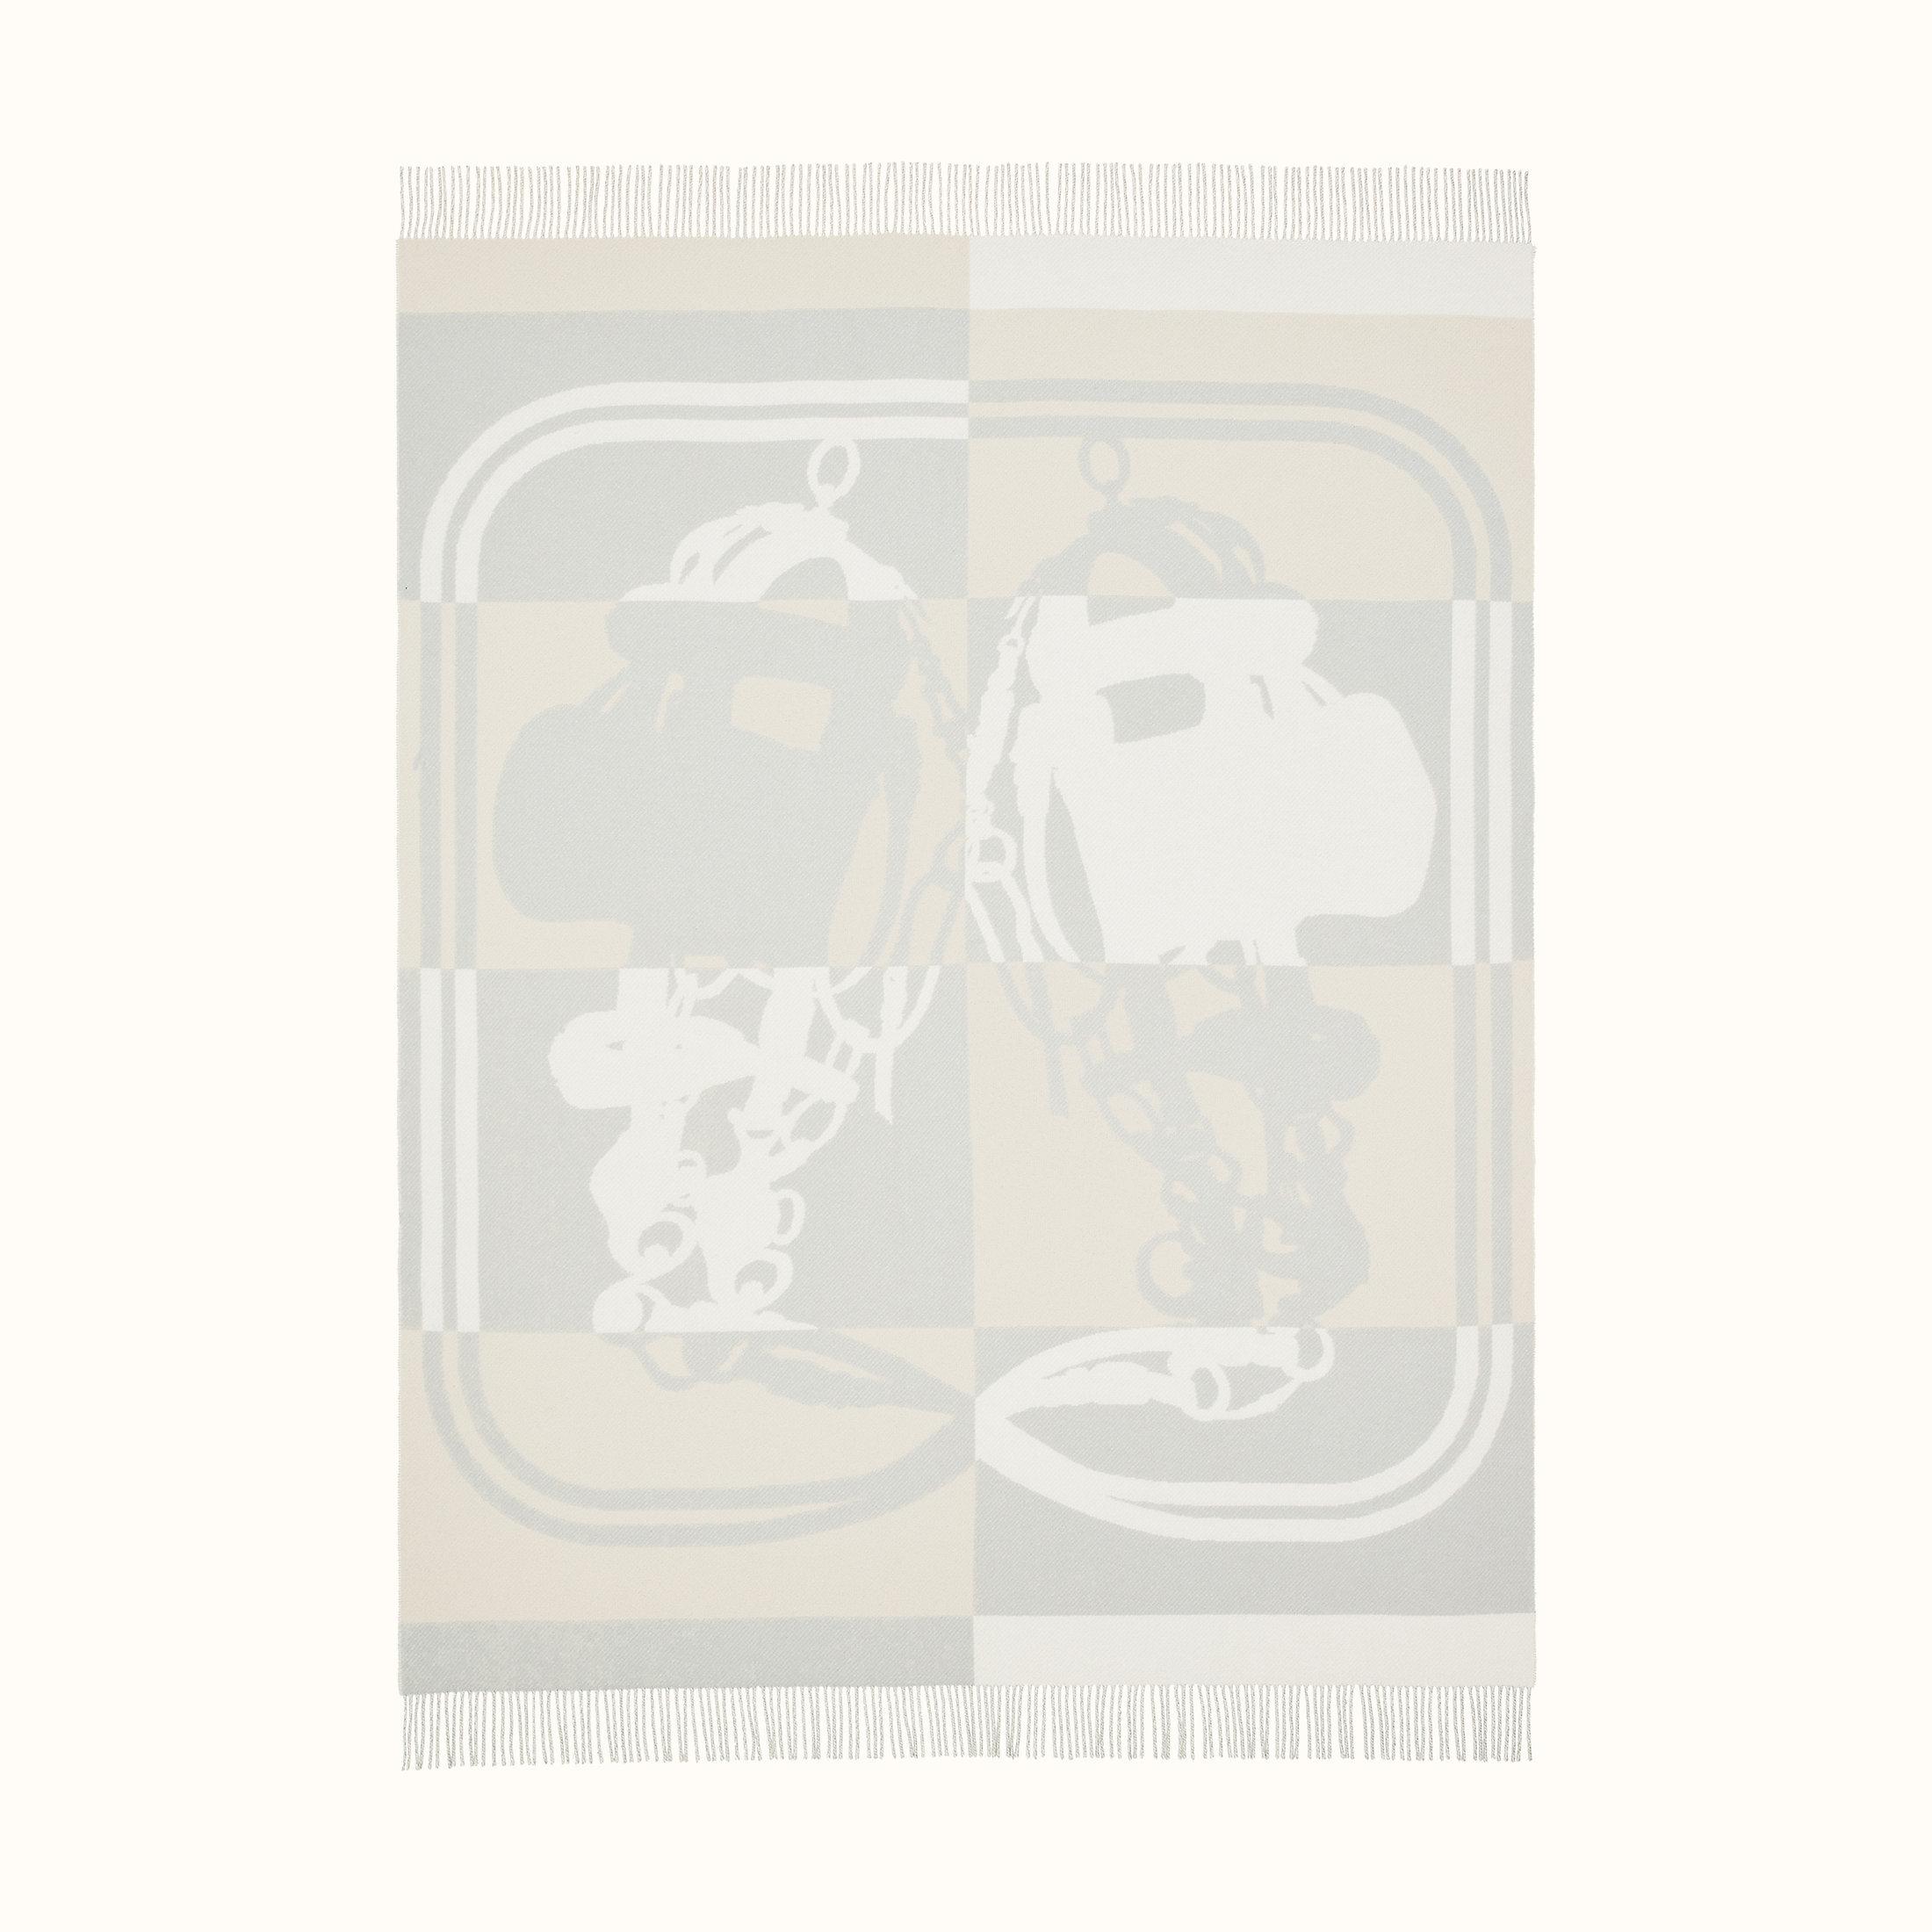 brides-de-gala-blanket--103255M 01-front-1-300-0-2200-2200_b.jpg